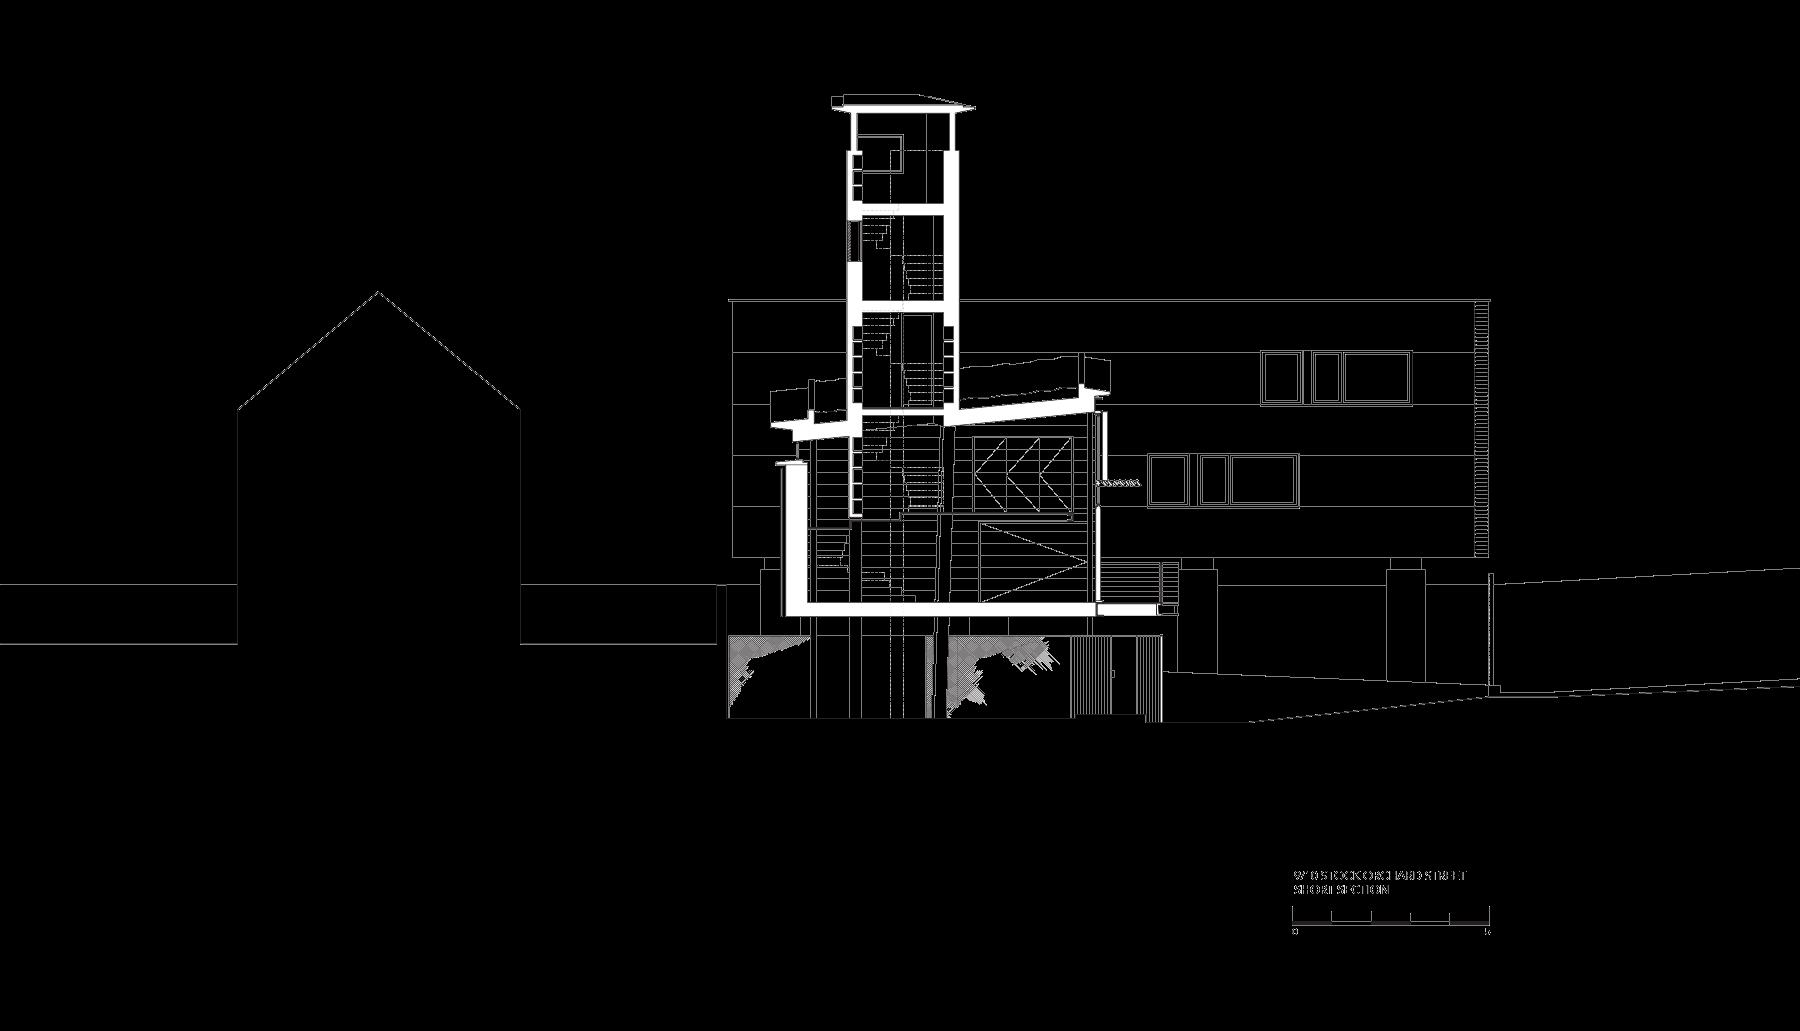 Sarah-Wigglesworth-Architects Stock-Orchard-Street short-section 1800